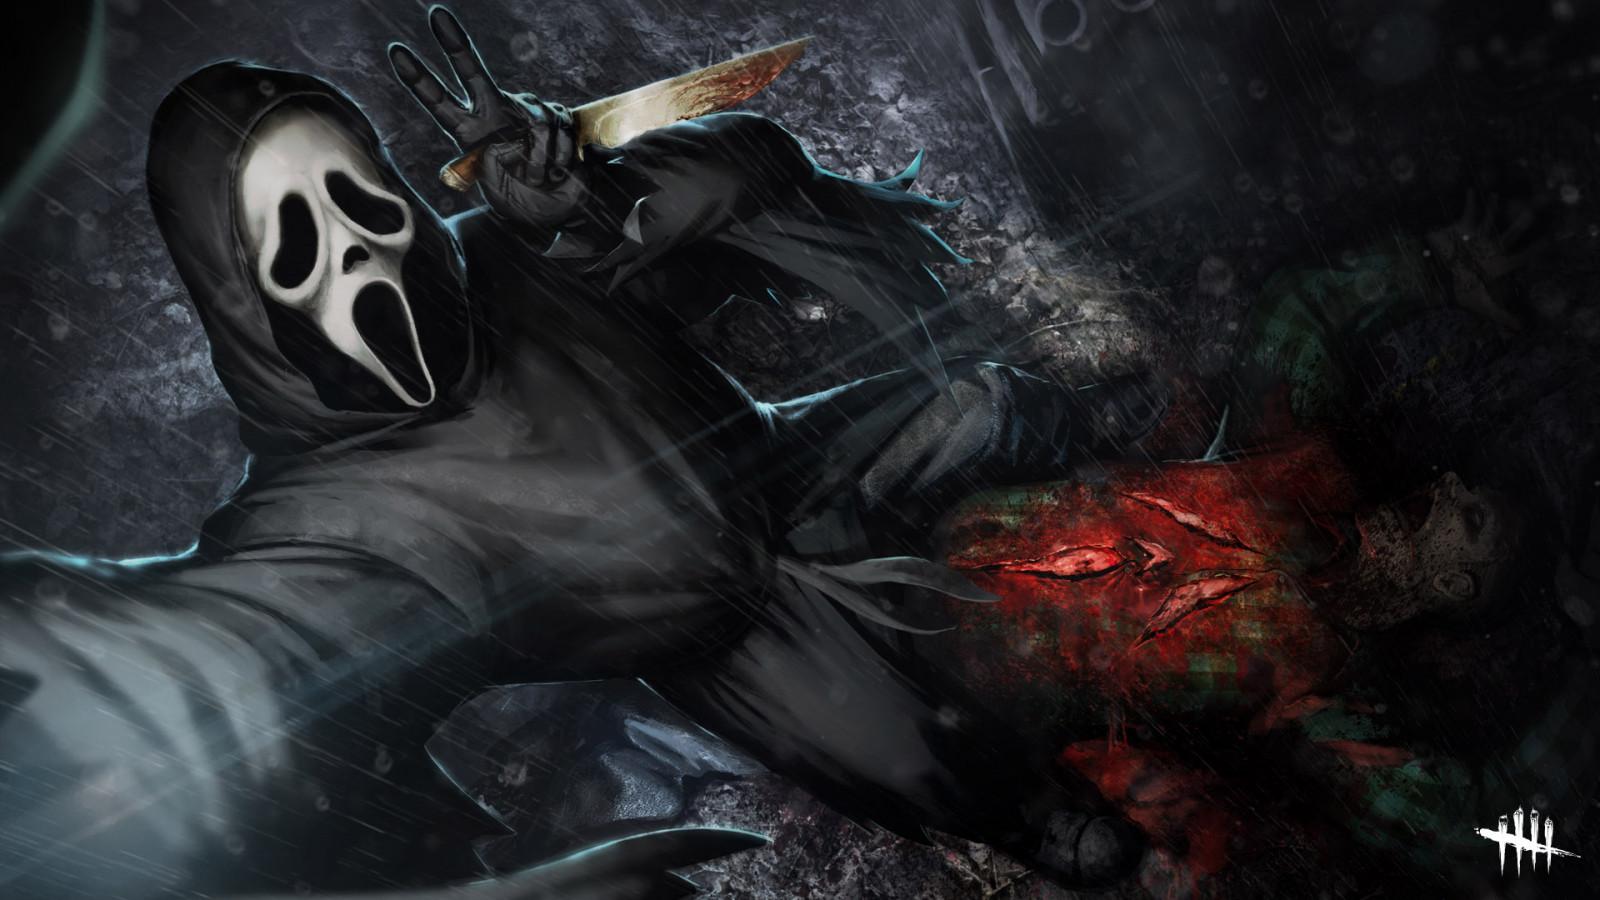 Wallpaper : Dead by Daylight, video games, Video Game Art ...